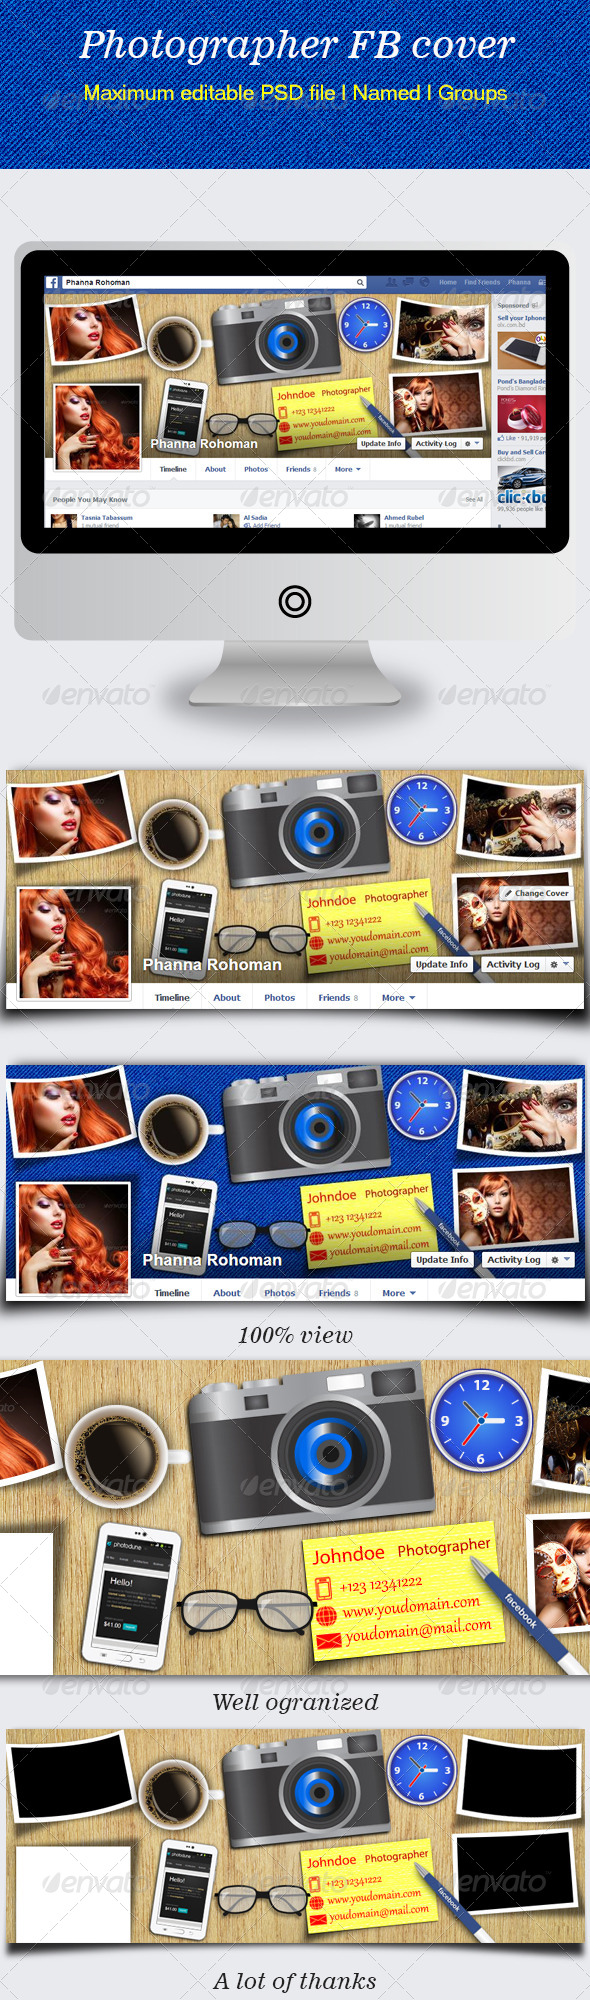 GraphicRiver Photographer FB Cover 6467870